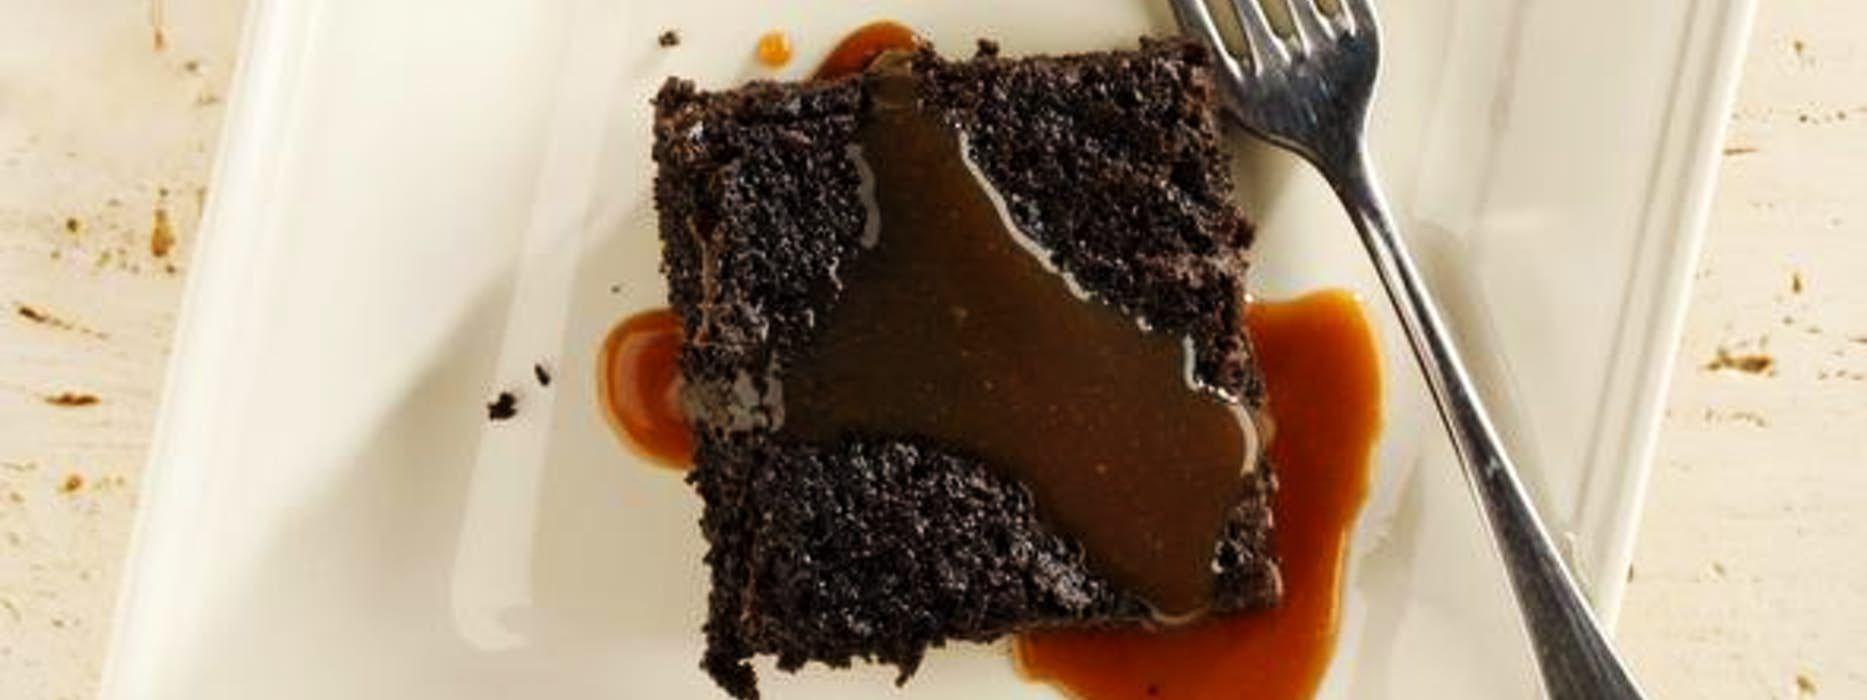 Dean fearings chocolate shiner bock cake desserts food